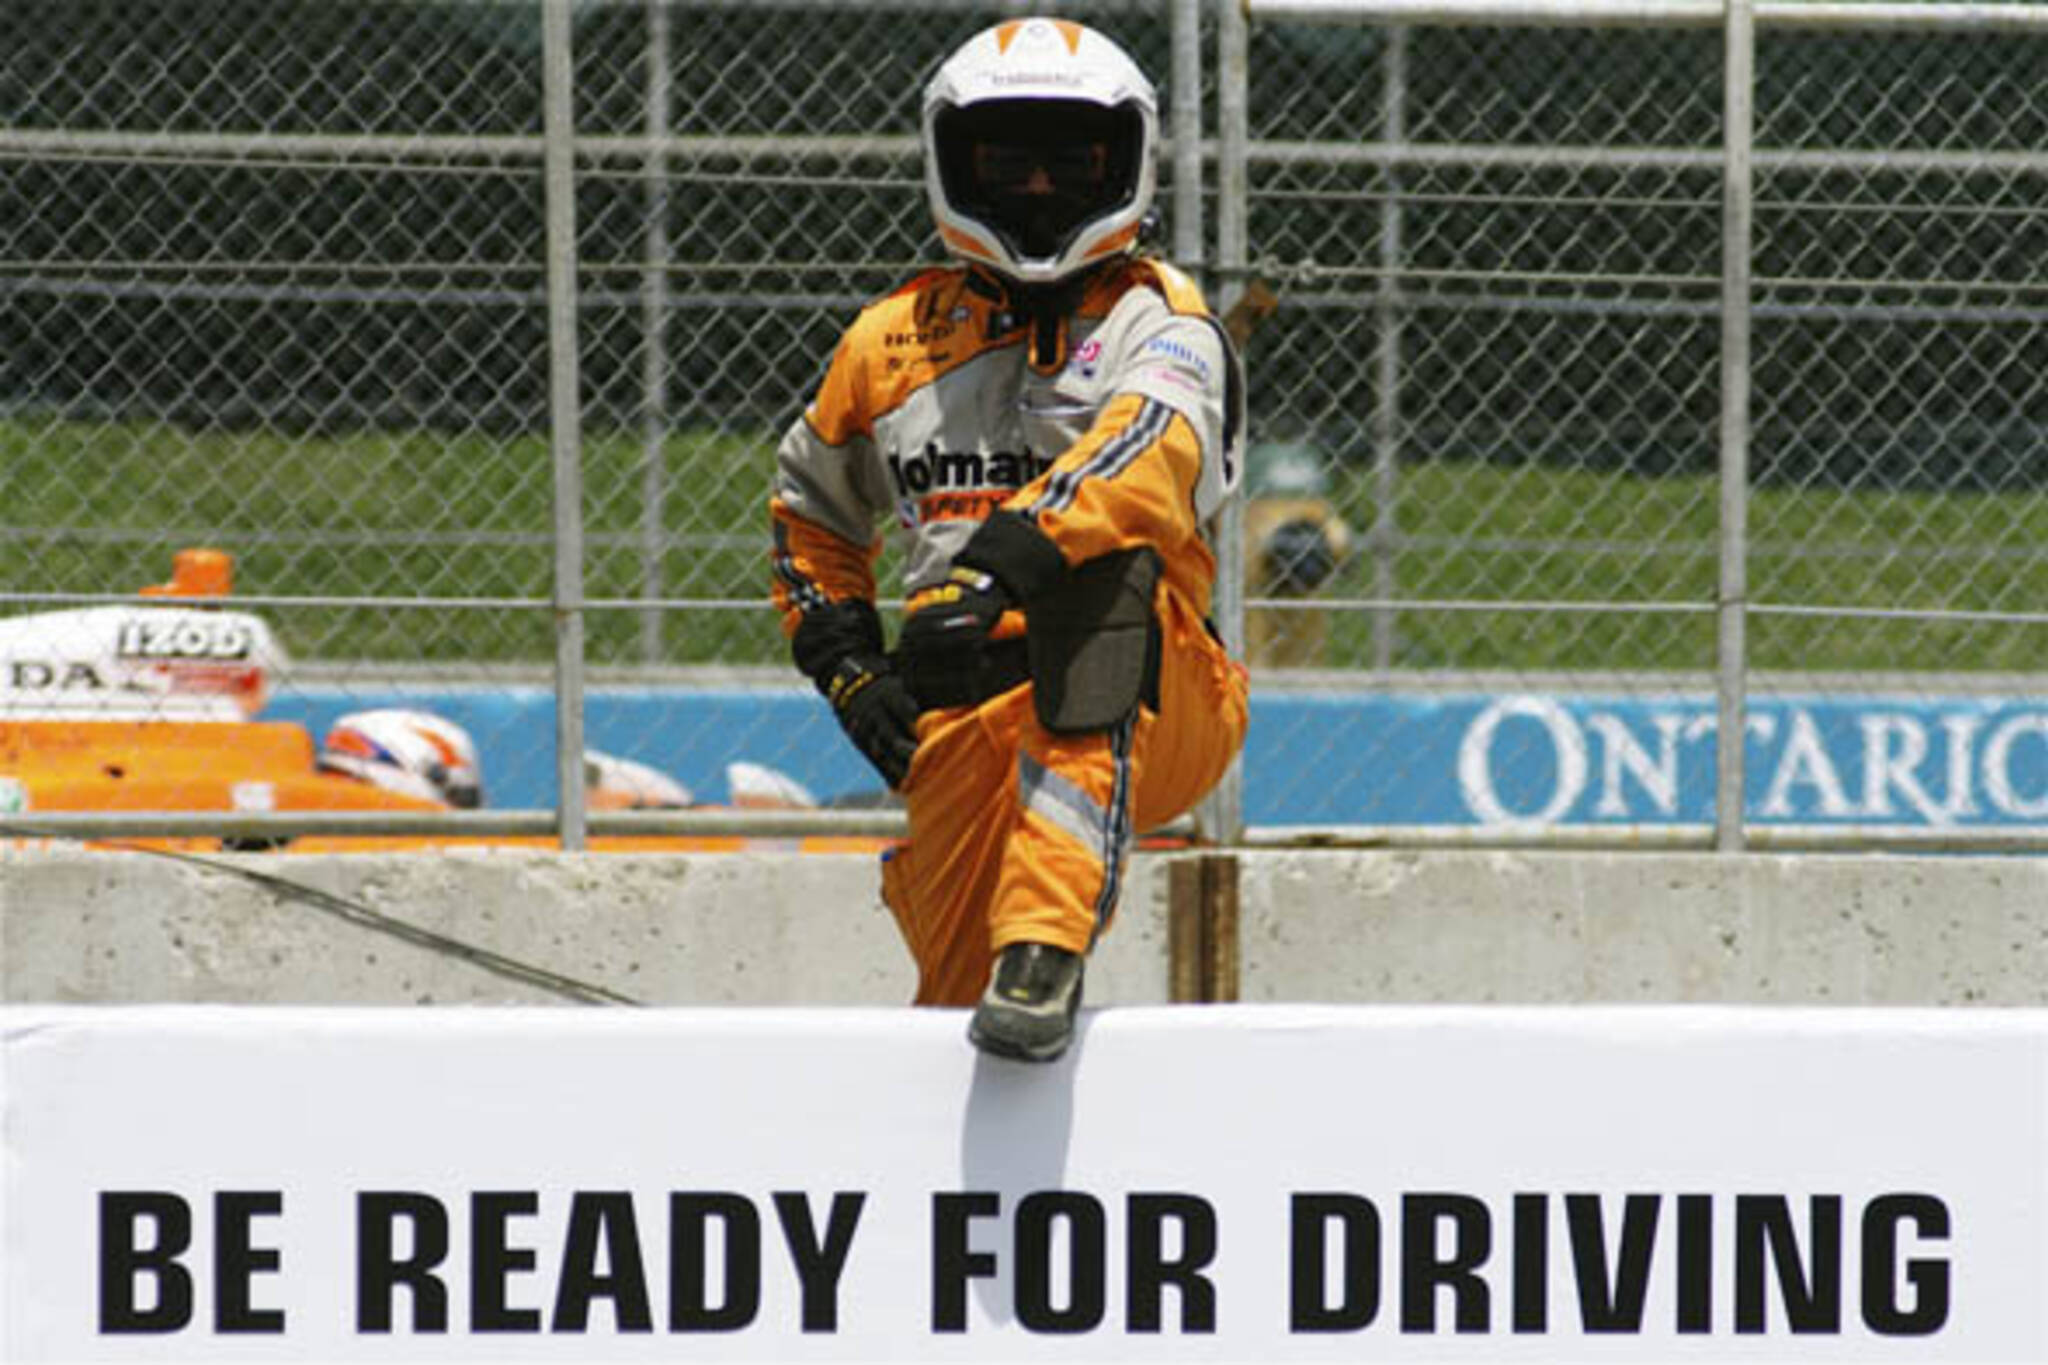 Honda Indy 2010 in Toronto